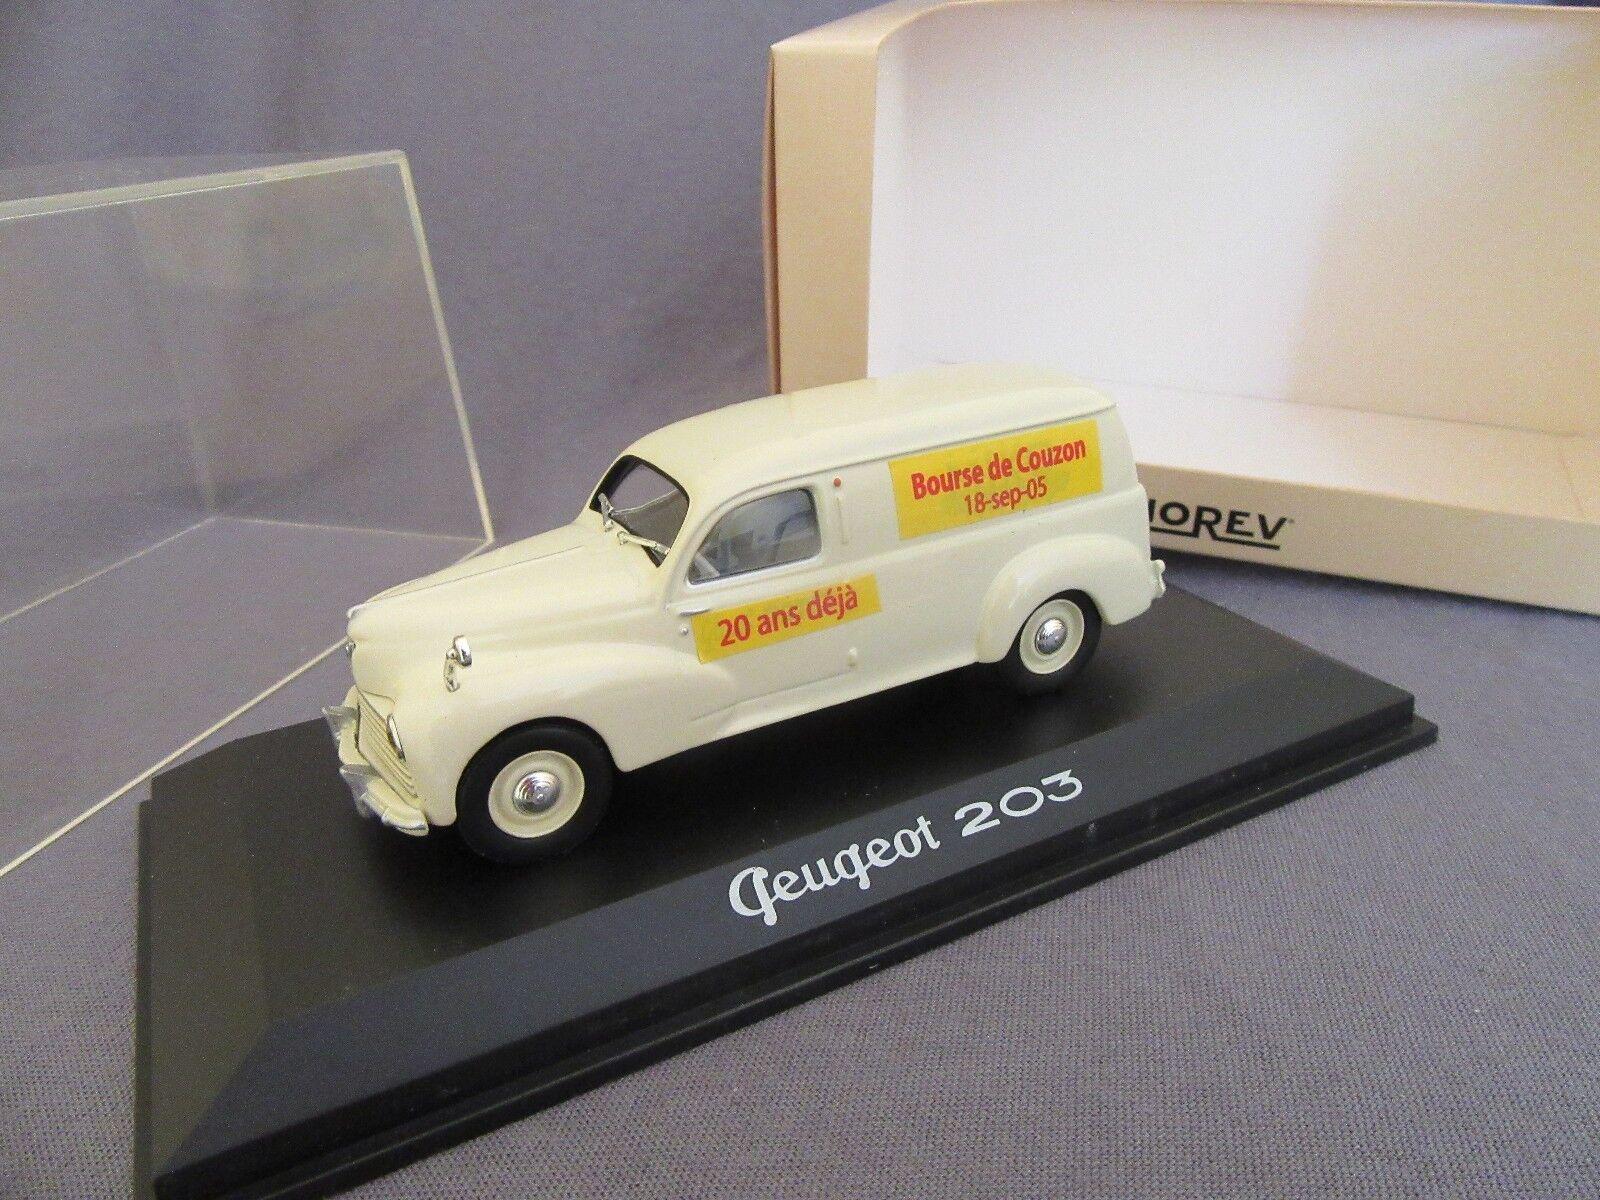 299G Norev 471012 Peugeot 203 Miko Pouch Couzon Miniatures 18 September 2005 1